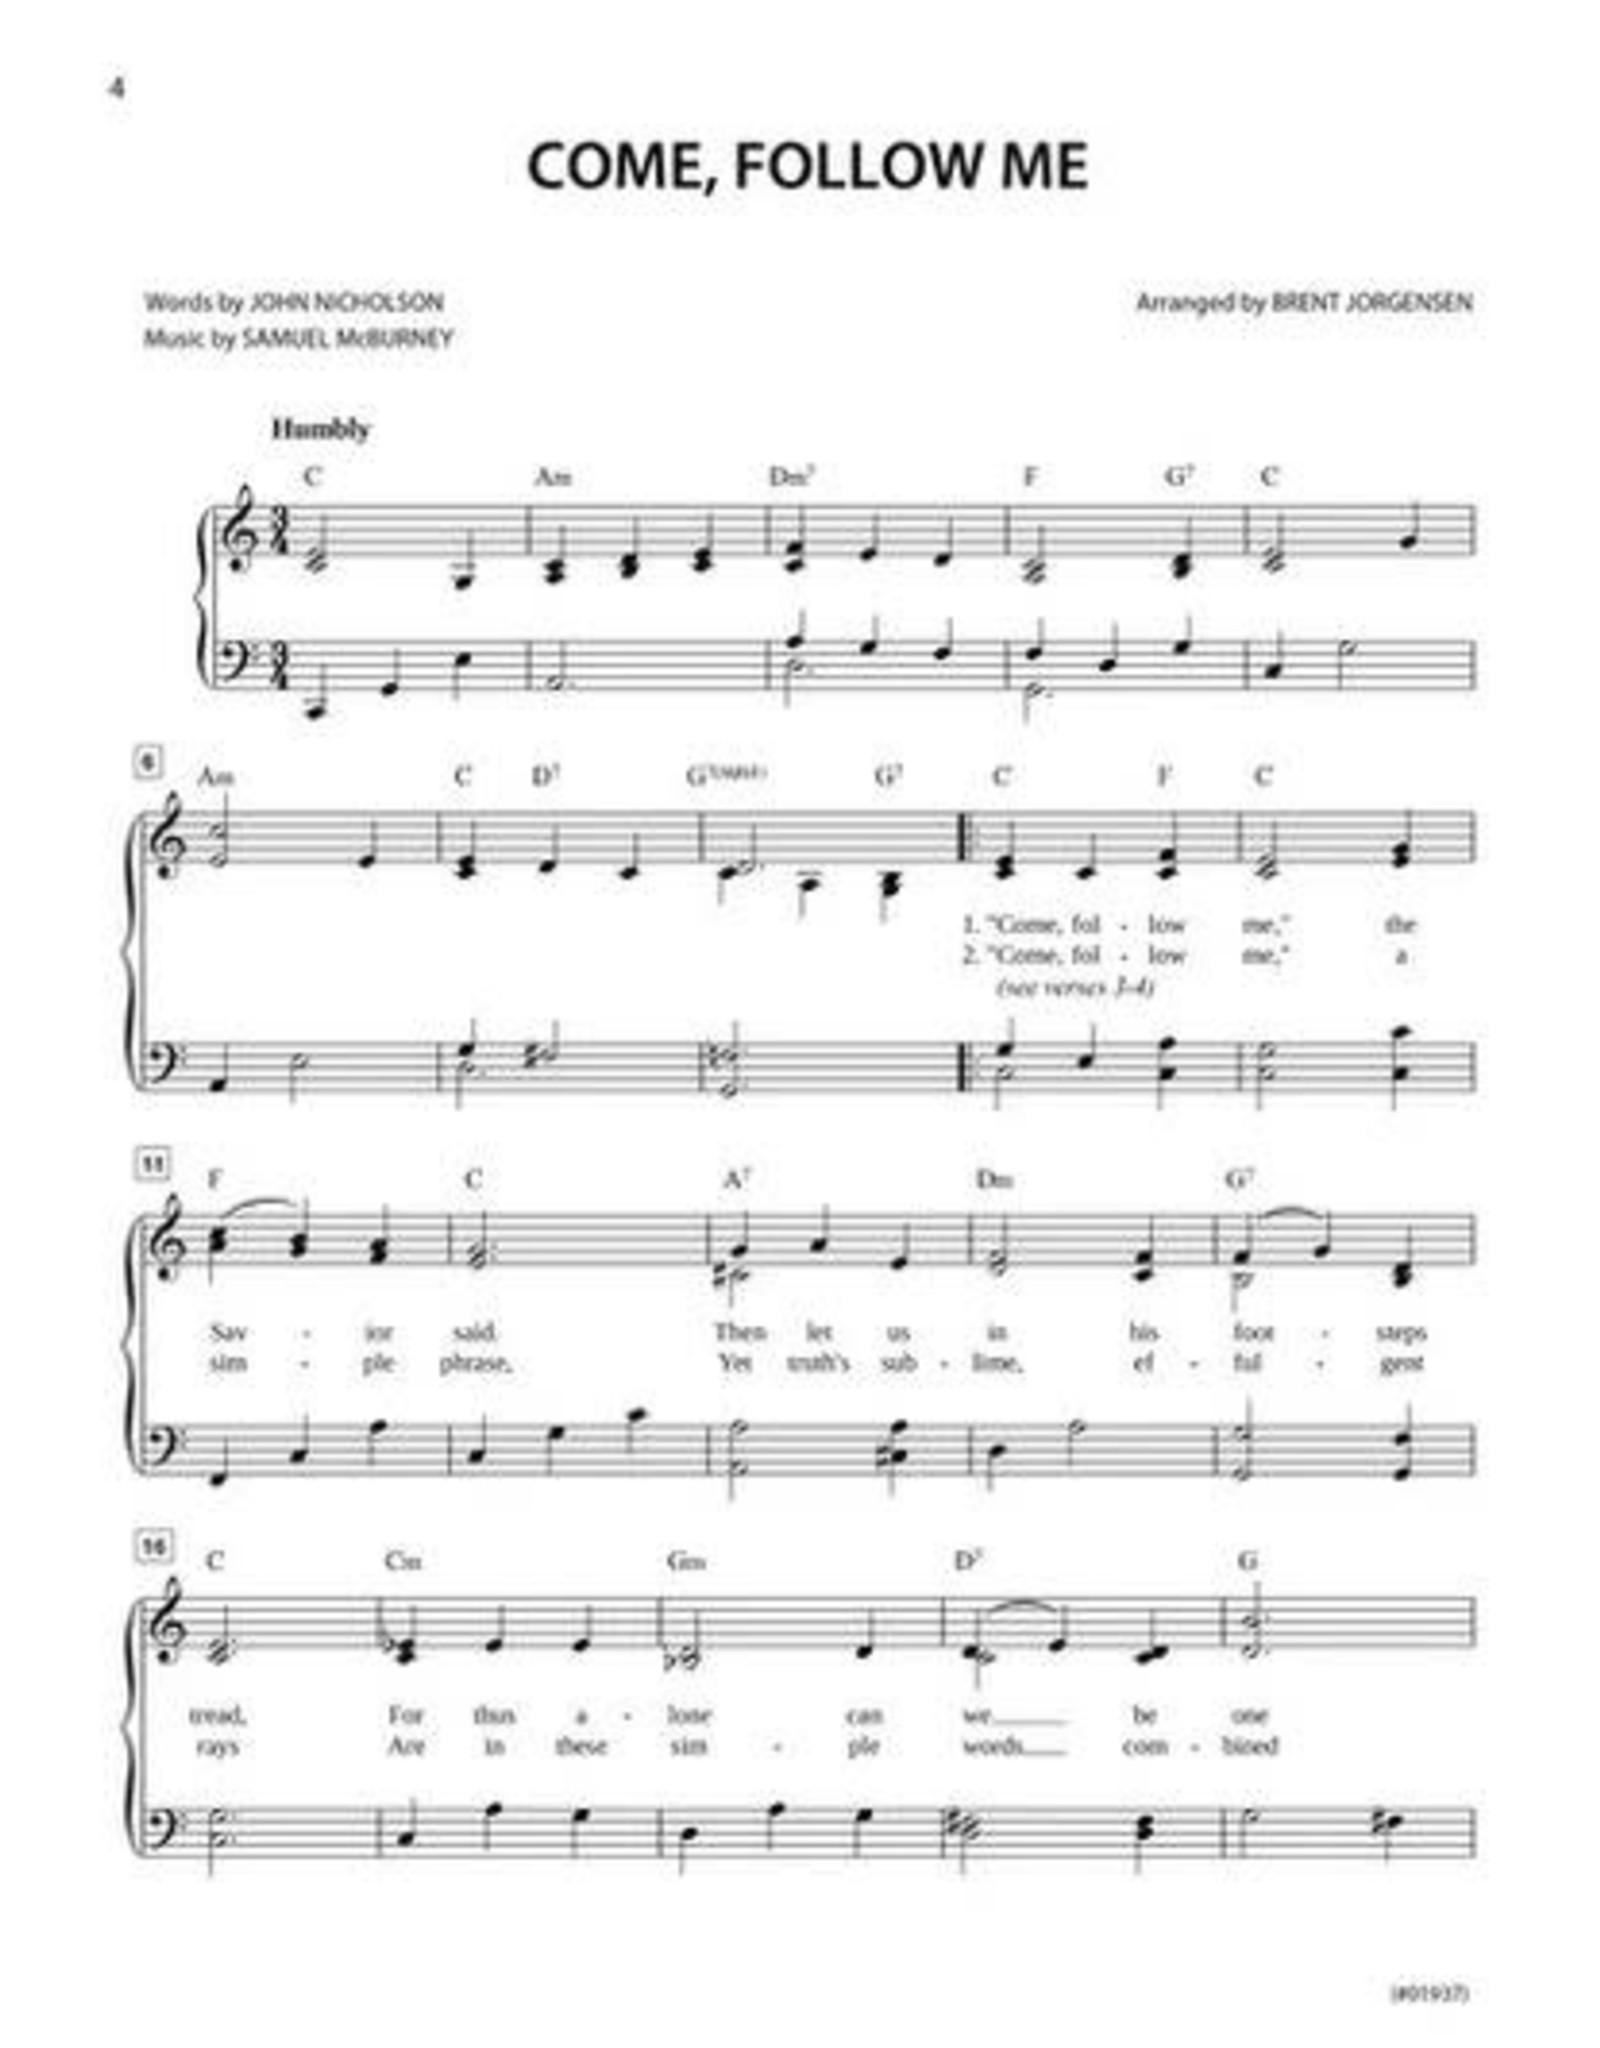 Jackman Music Hymn-Alongs Vol. 1 - arr. Brent Jorgensen - Piano Accompaniment Book